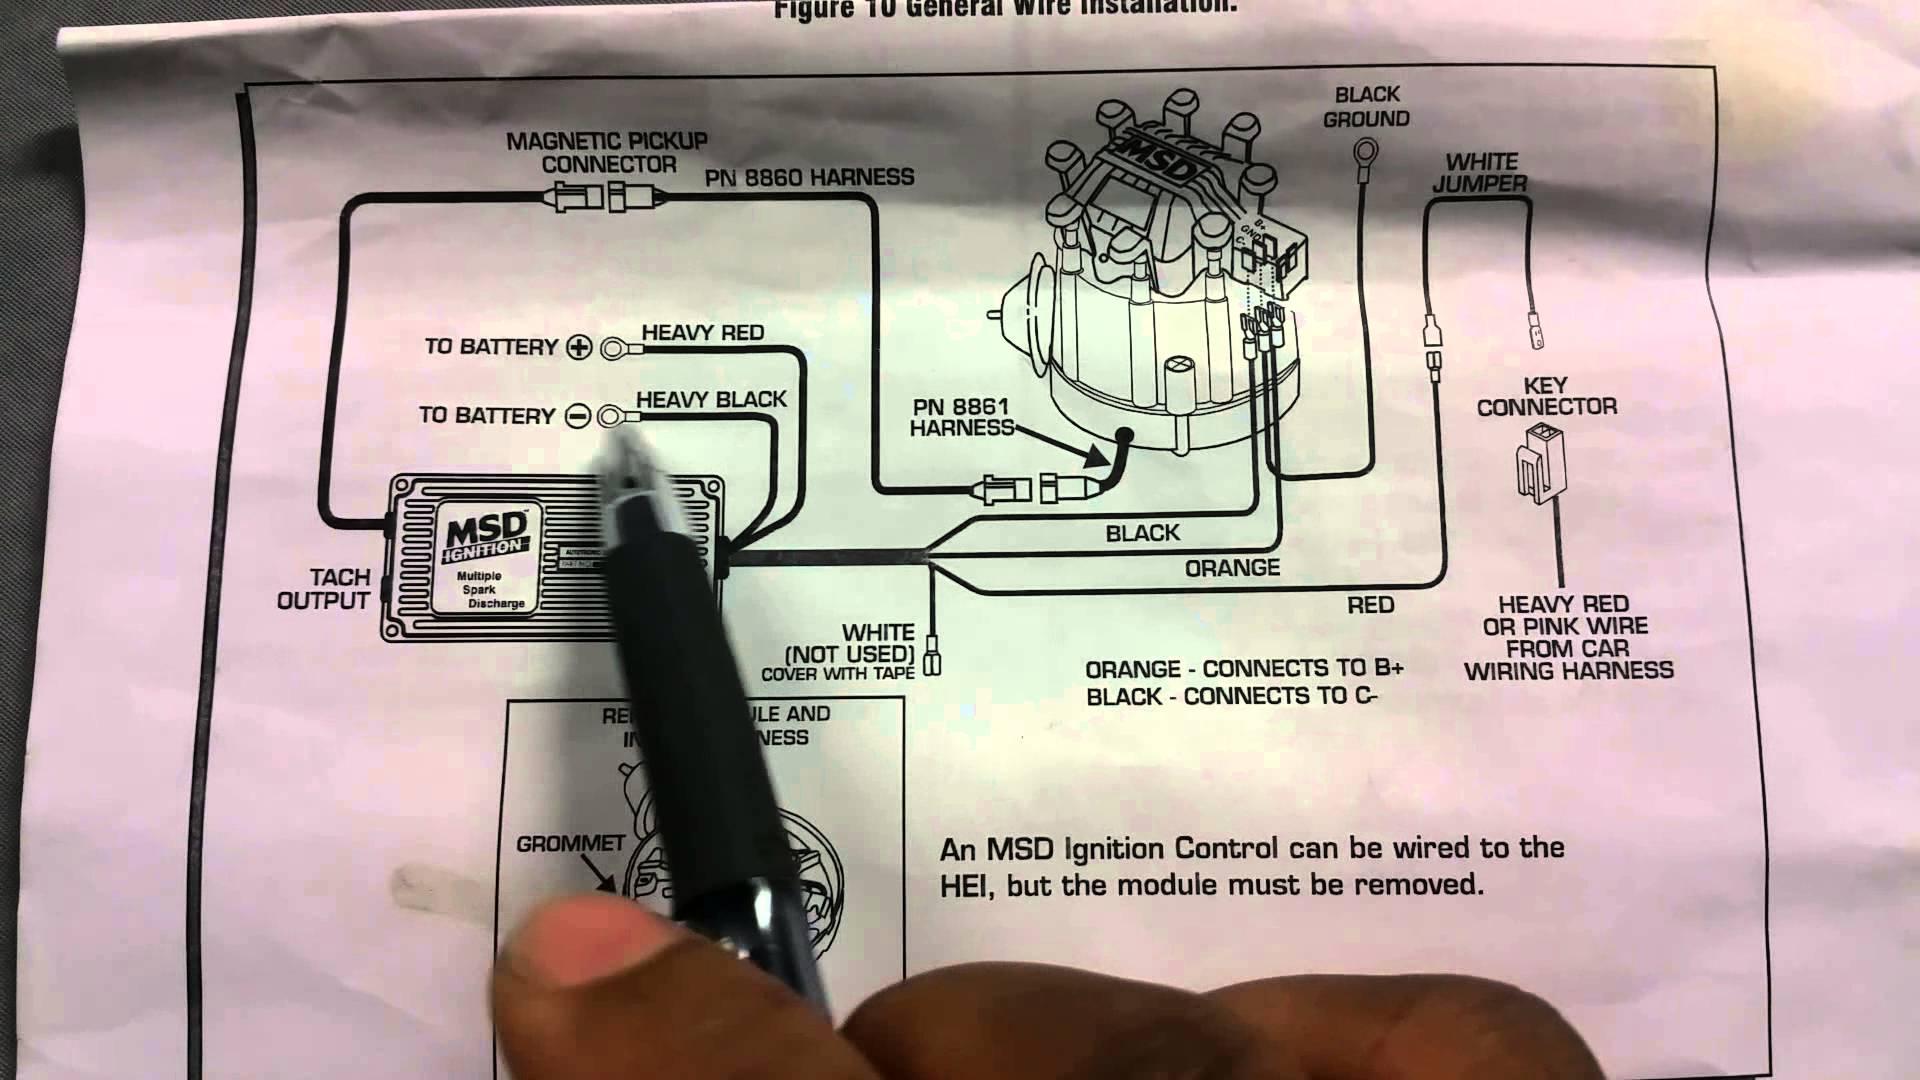 Msd Ignition Box Wiring Diagram - Motherwill - Msd Ignition Wiring Diagram Chevy